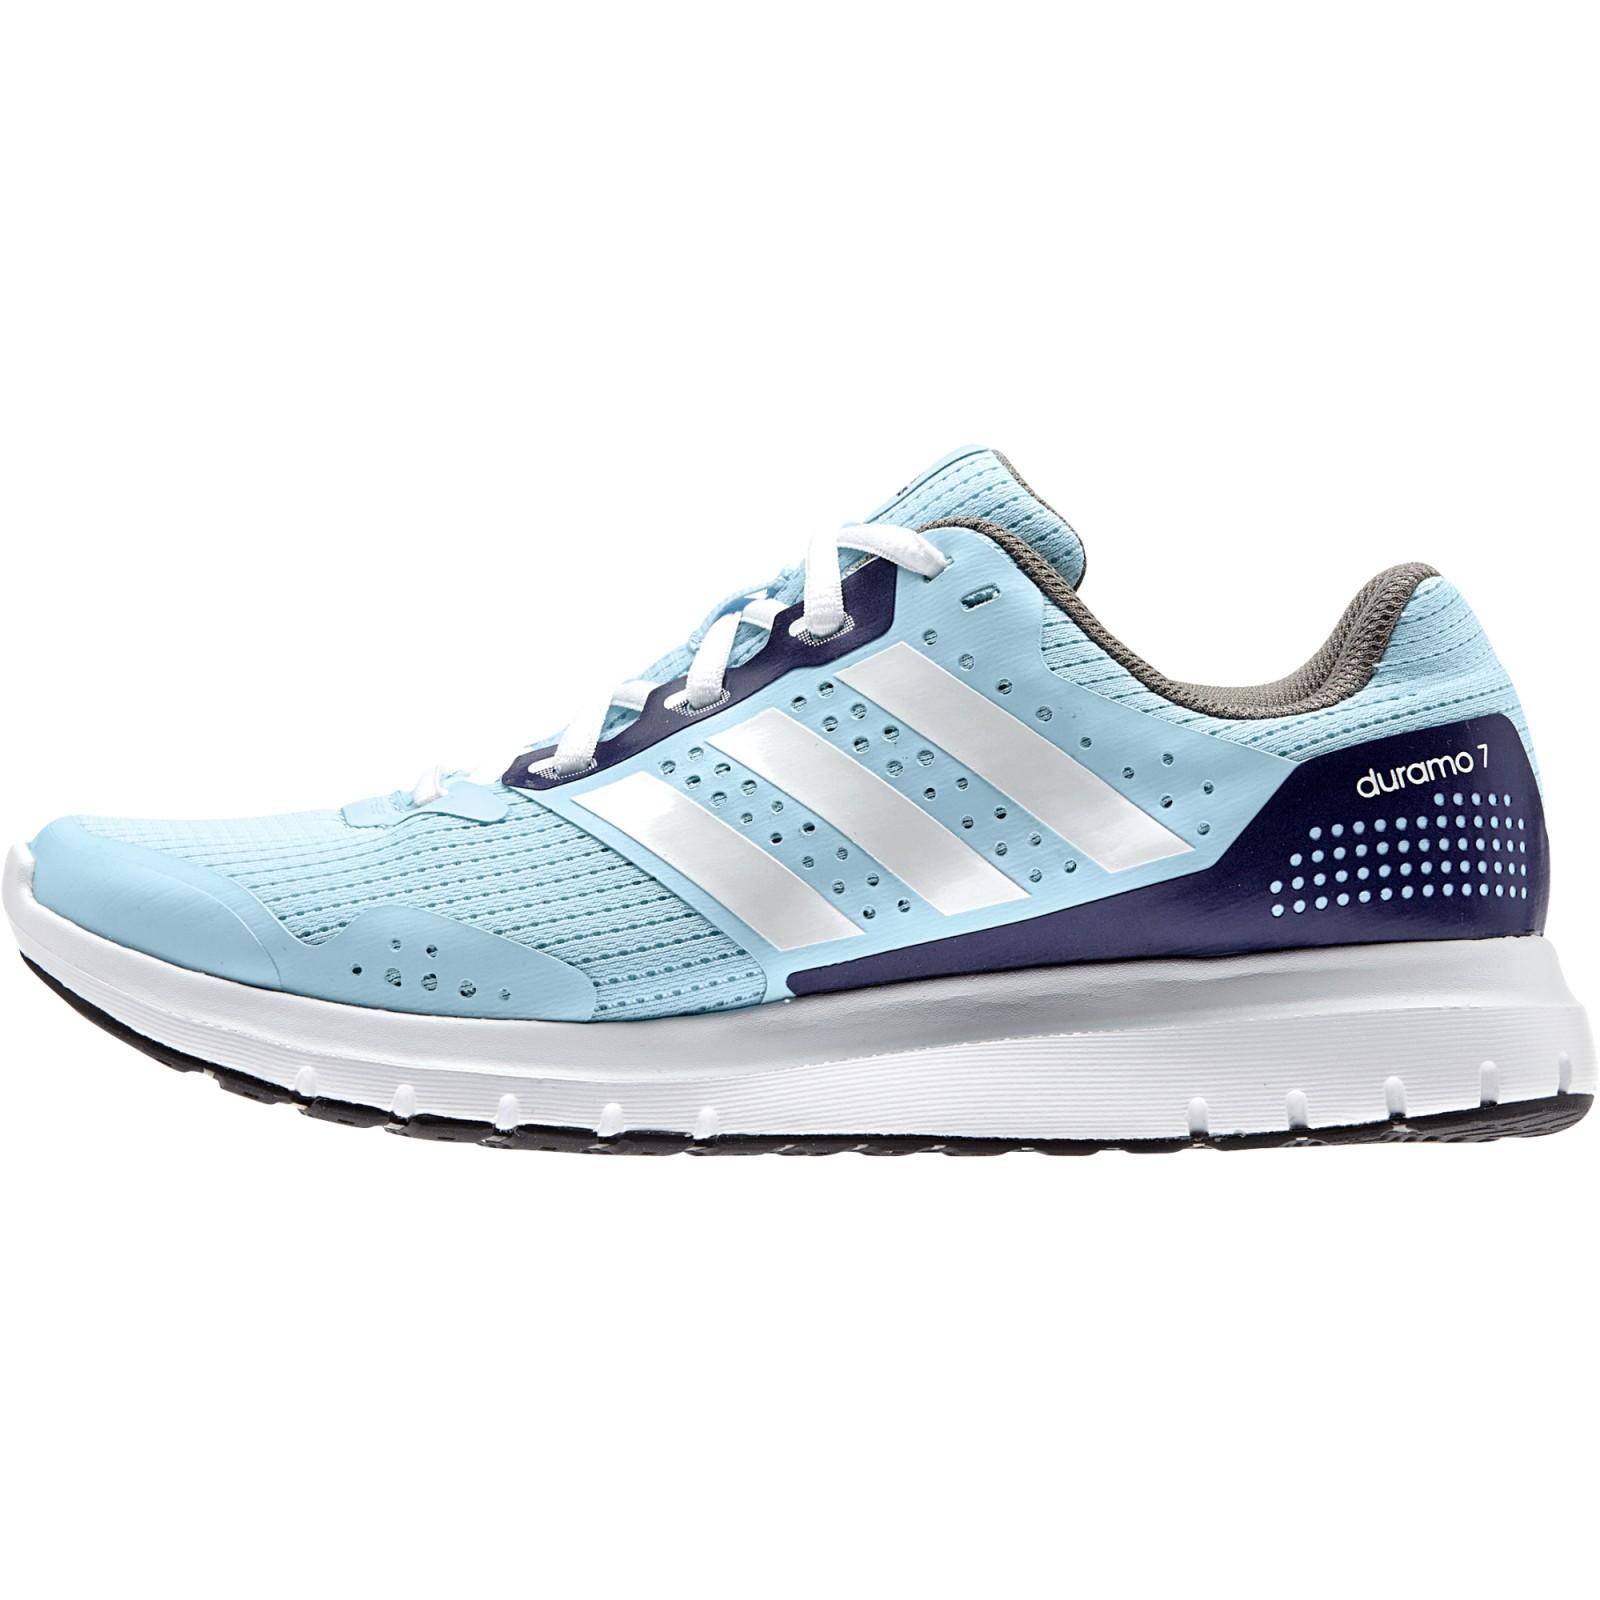 Dámské běžecké boty adidas duramo 7 w  eabb822e959